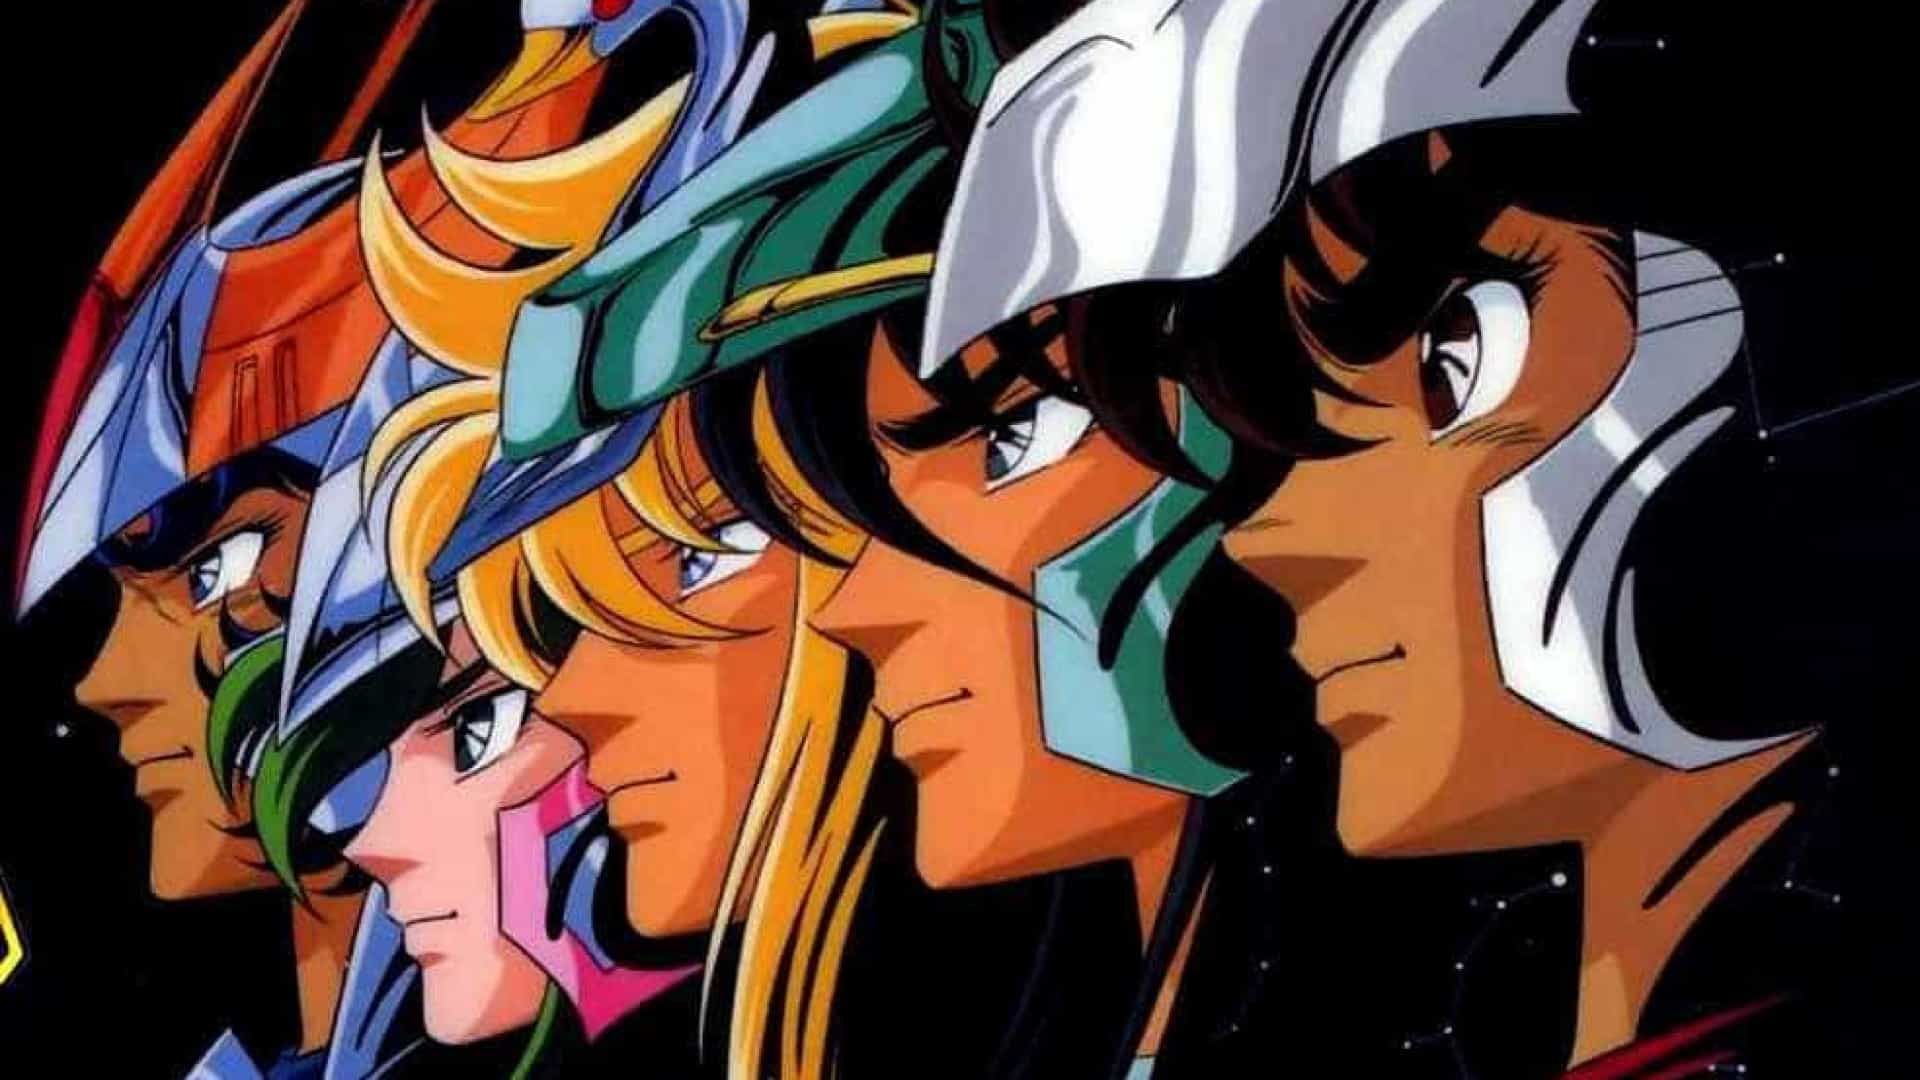 Cavaleiros do Zodíaco Online será lançado no Brasil